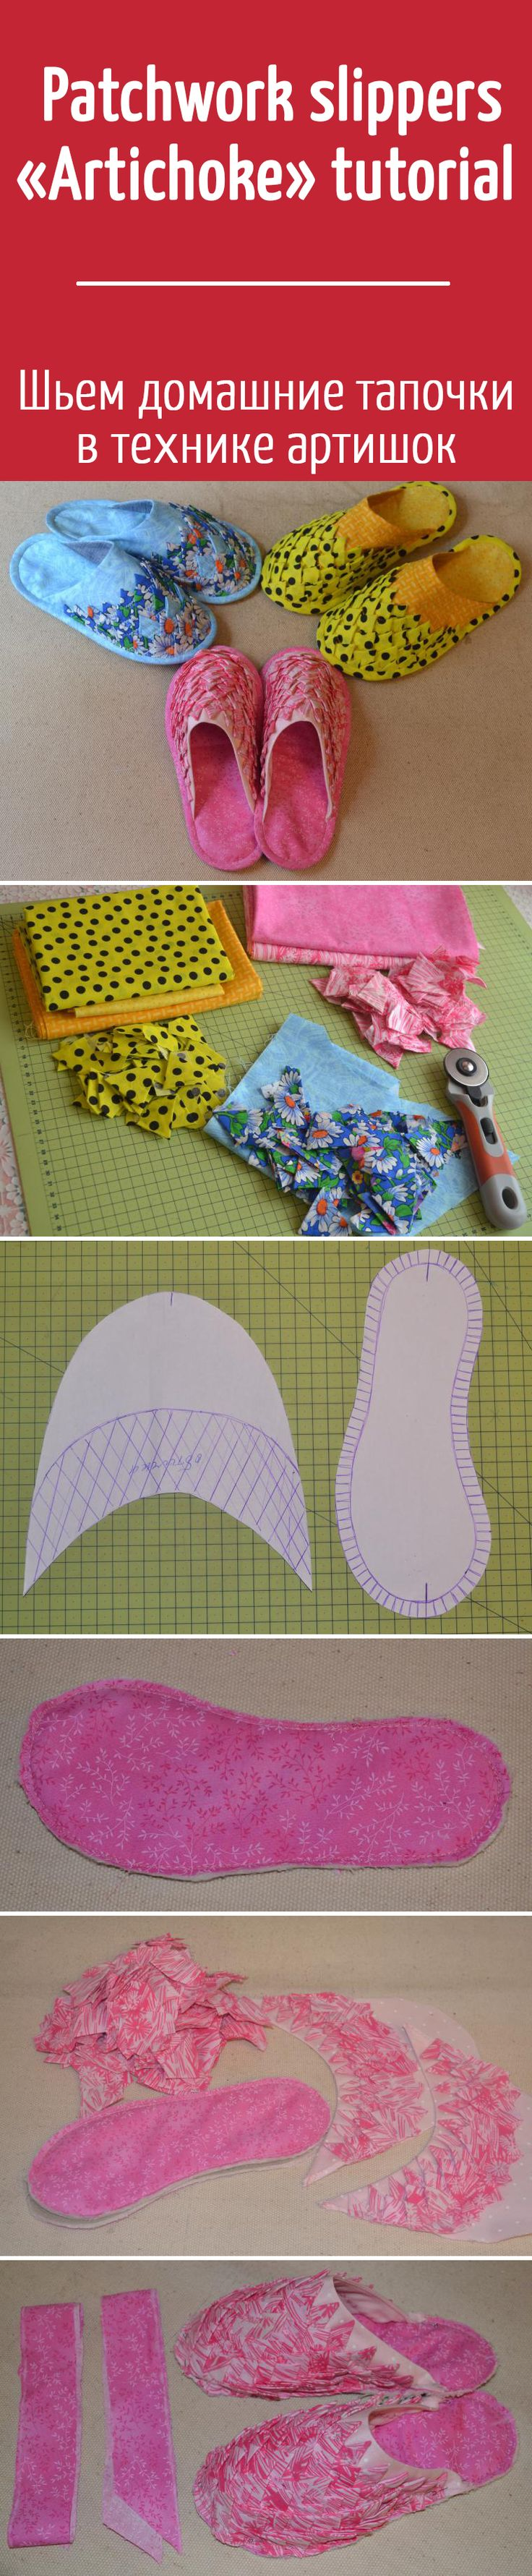 Patchwork slippers «Artichoke» tutorial / Шьем домашние тапочки в технике артишок